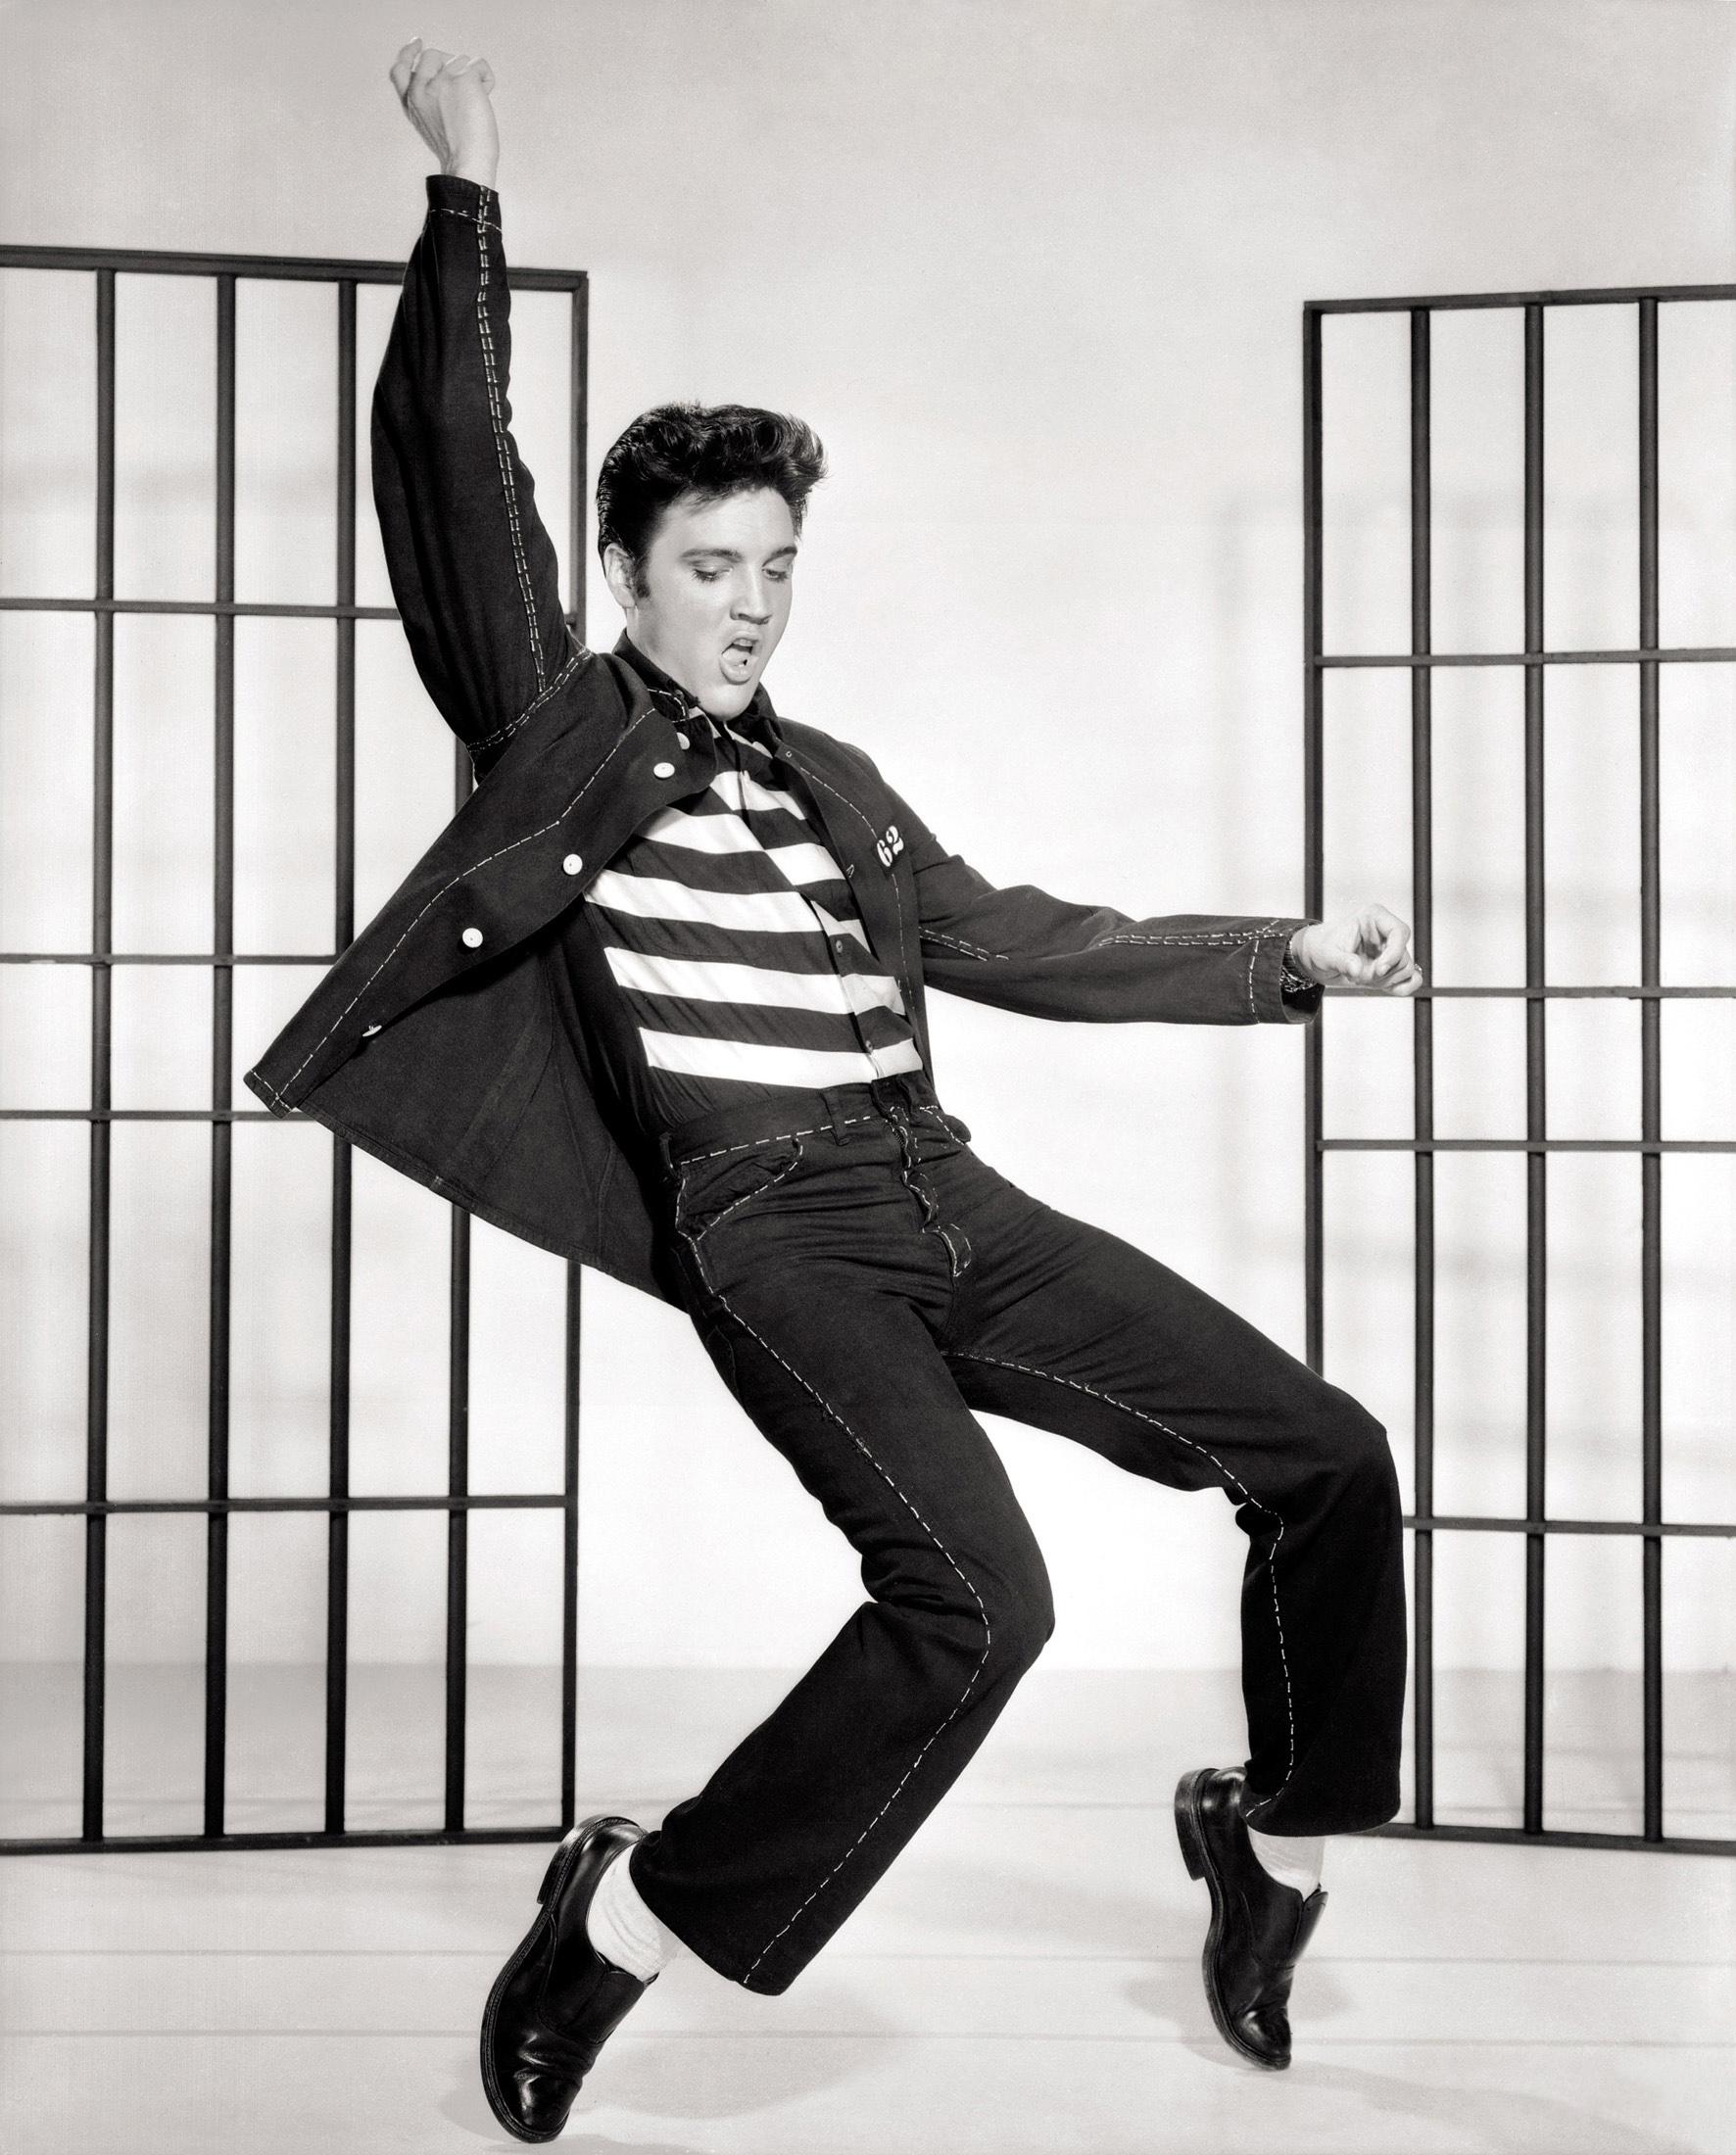 Publicity still of Elvis Presley in Jailhouse Rock.